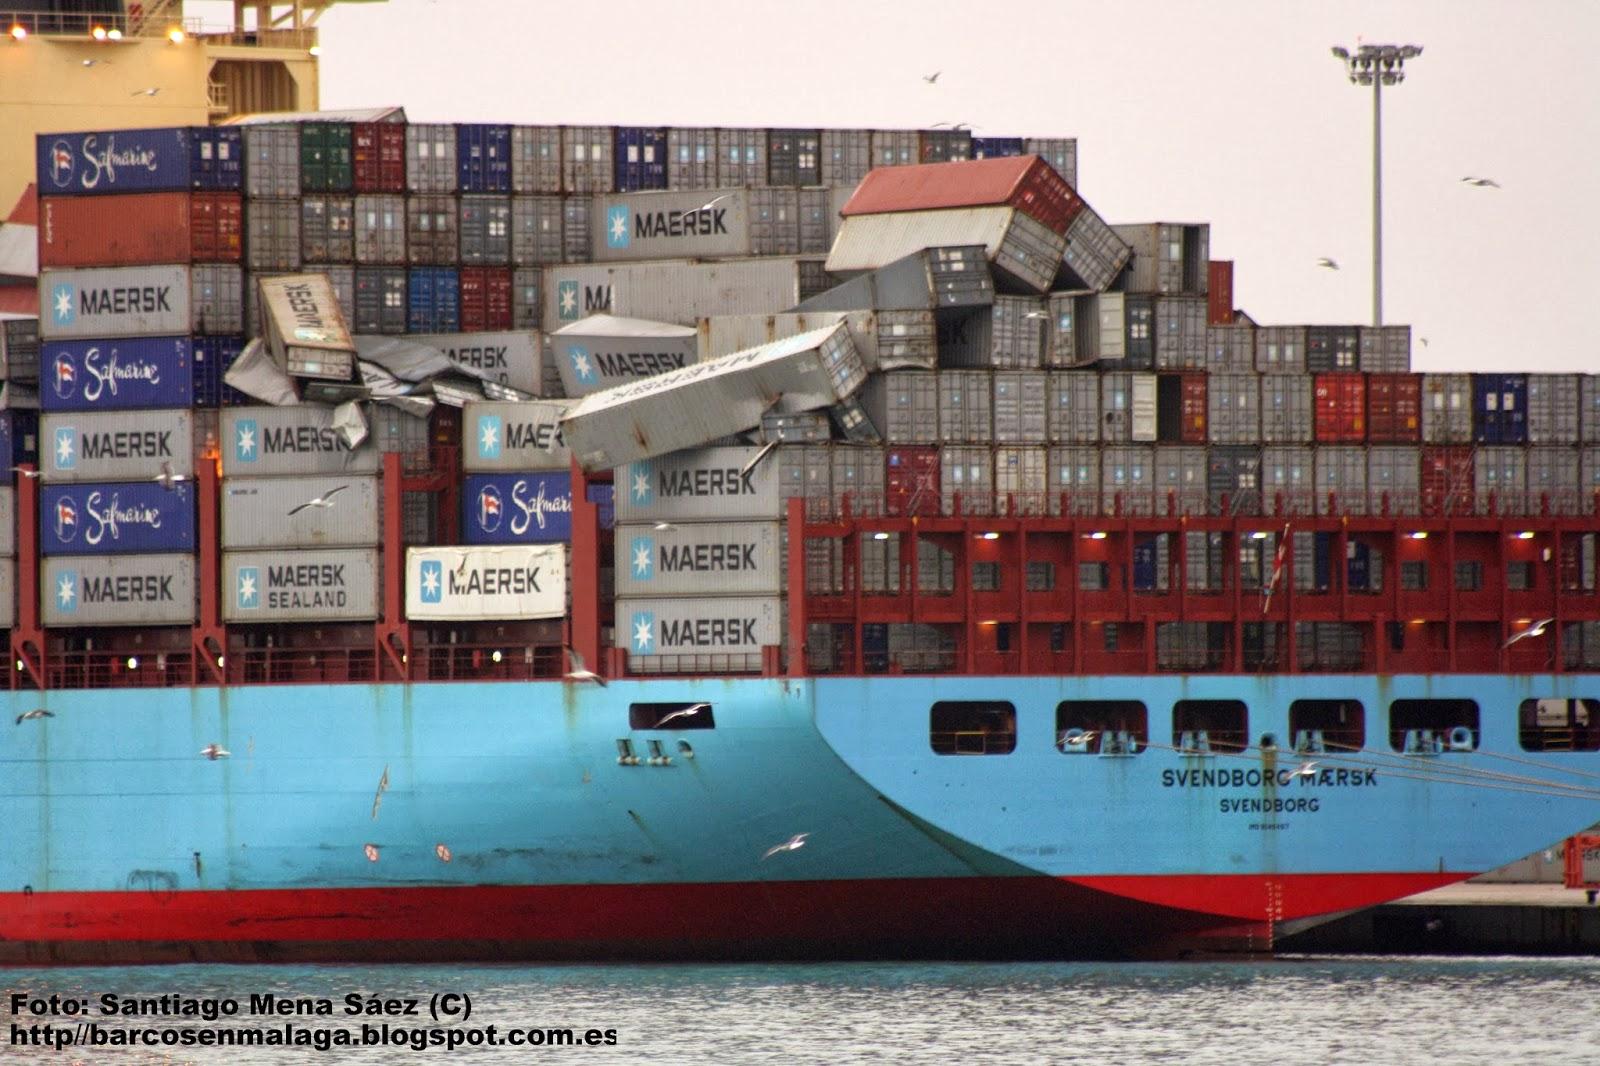 Barcos en m laga svendborg maersk incidente con la carga - Contenedores de barco ...